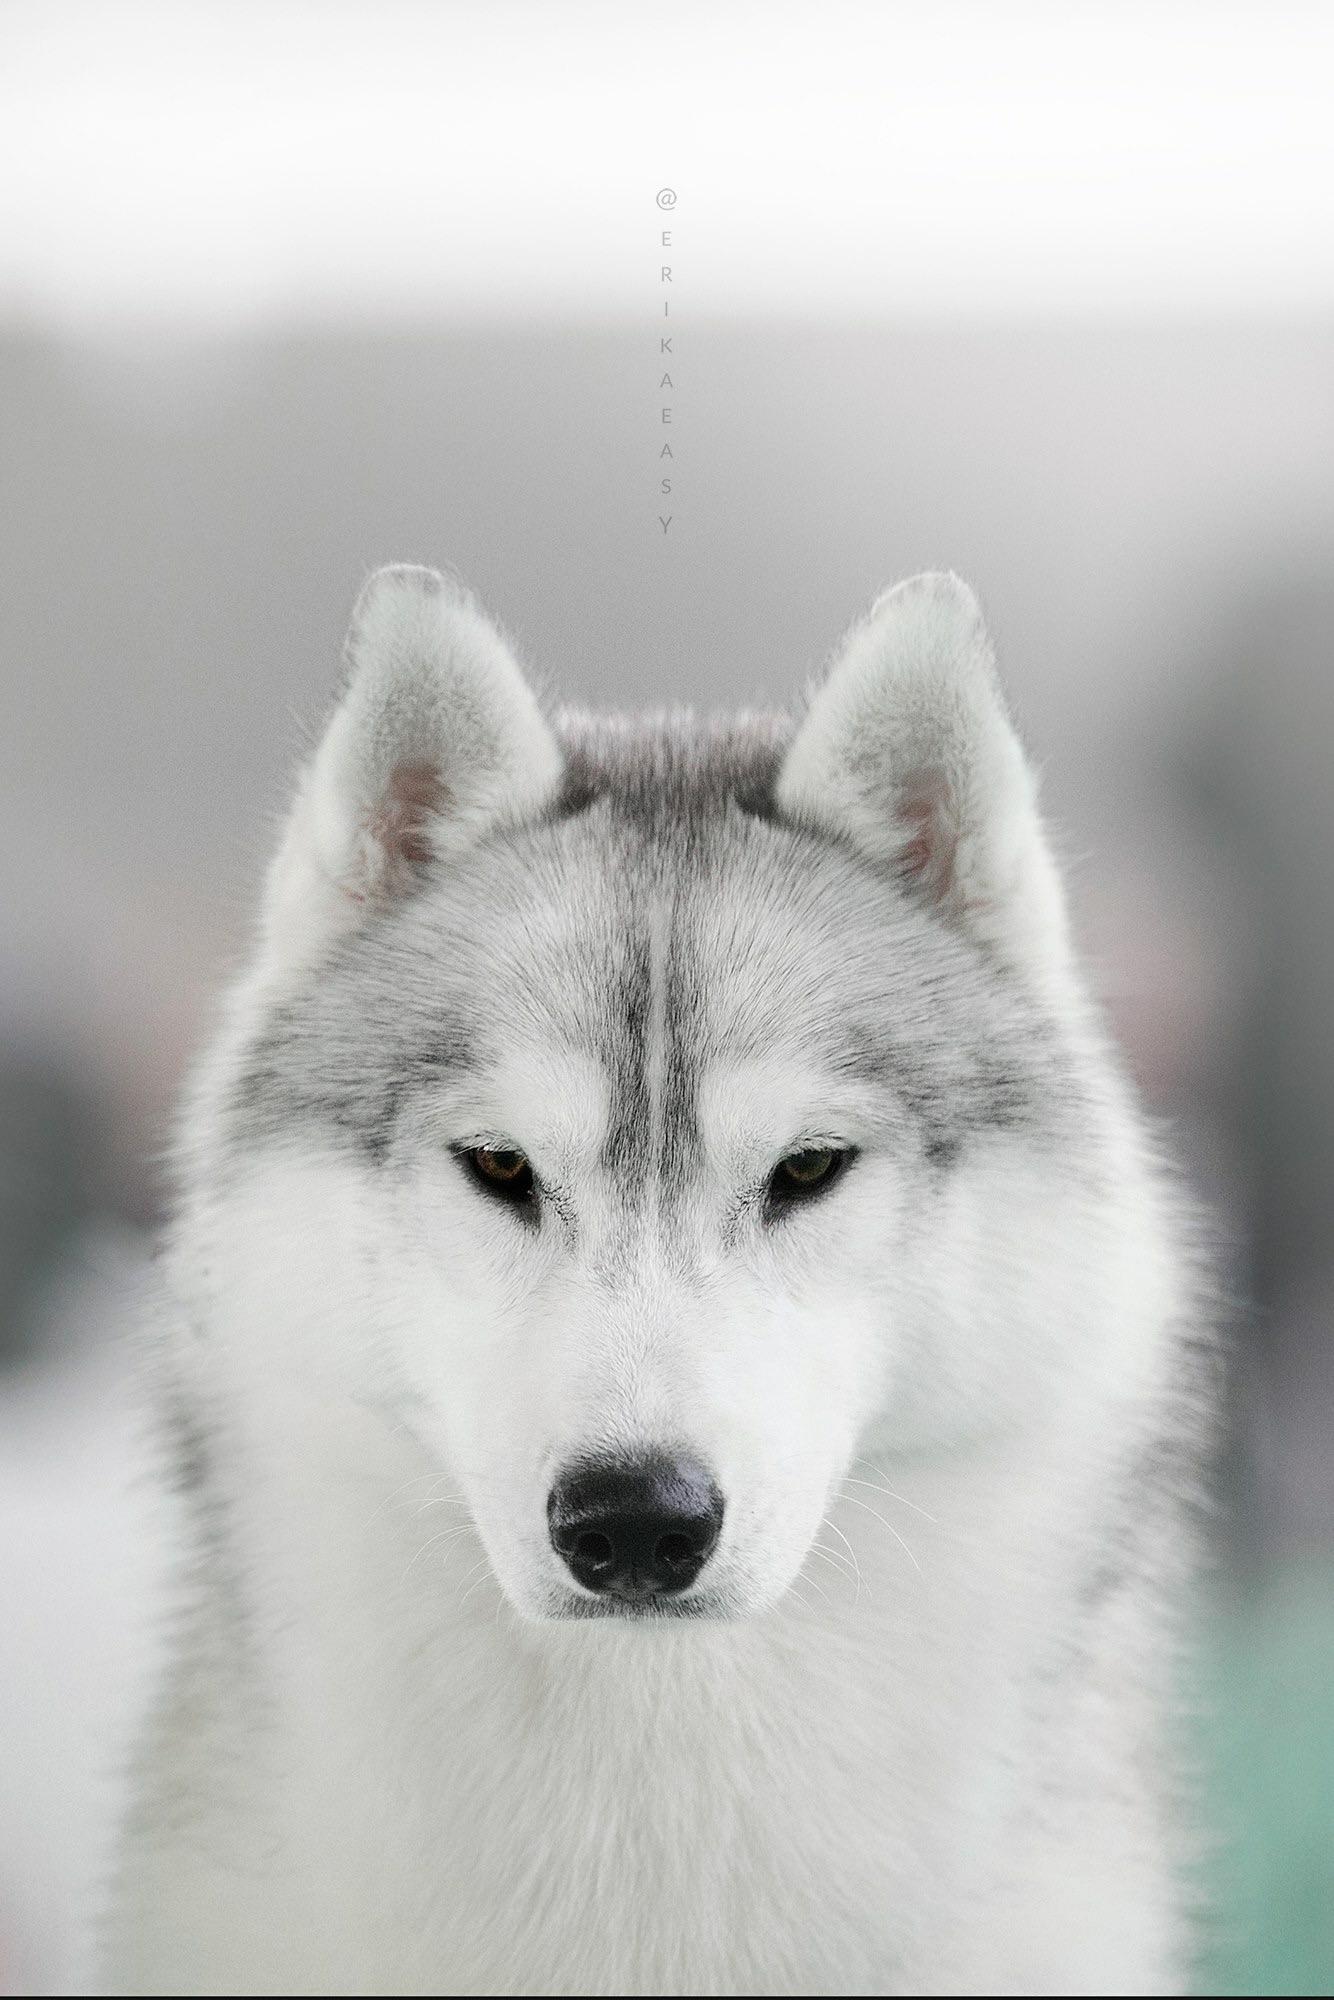 Husky from ChamonixDeus